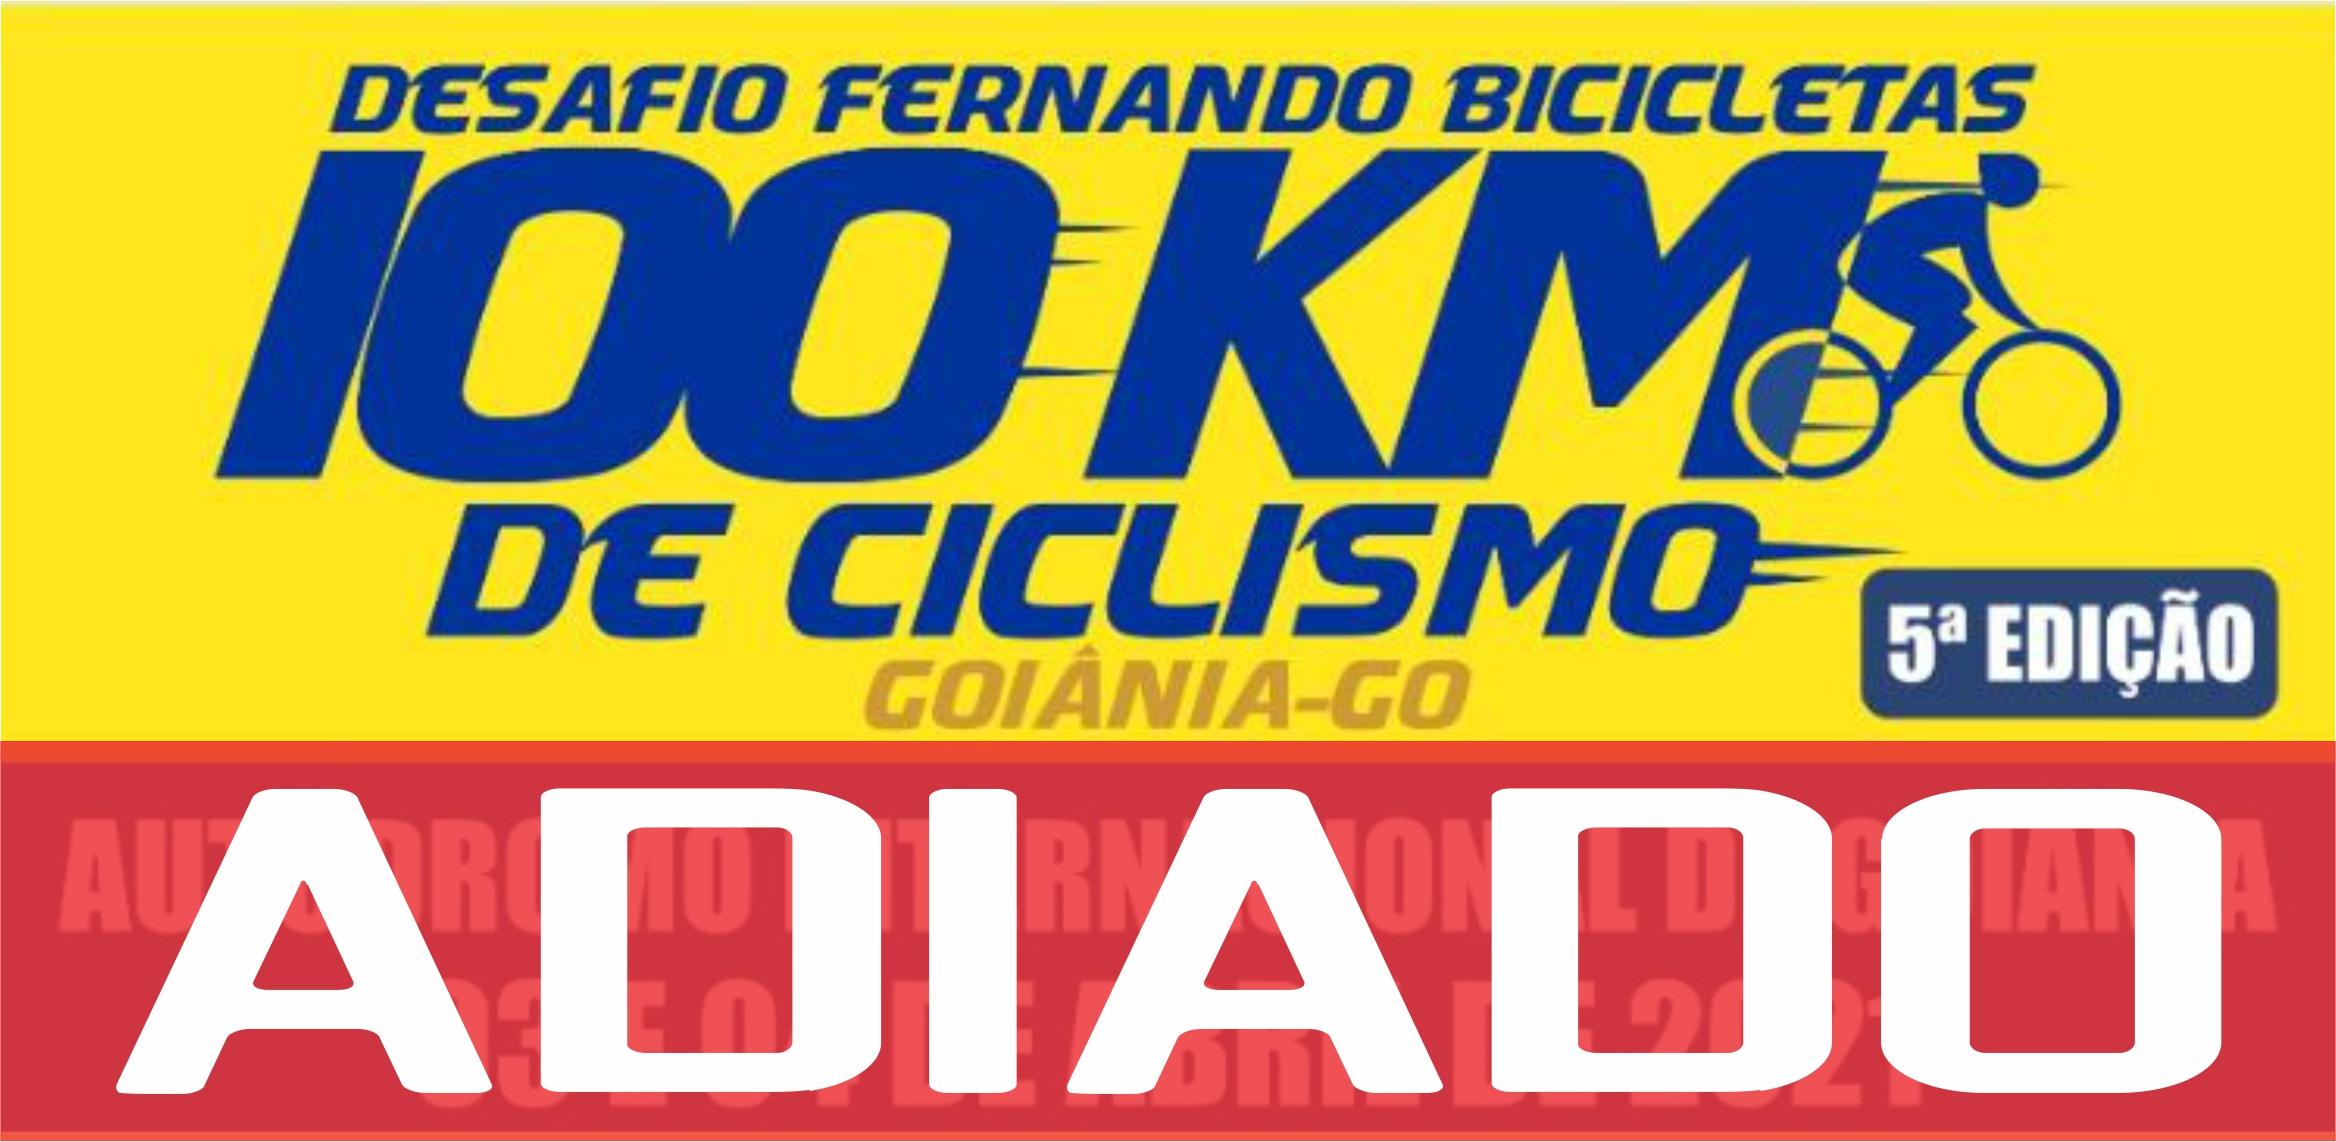 desafio-fernando-bicicletas-2021-sistime-01